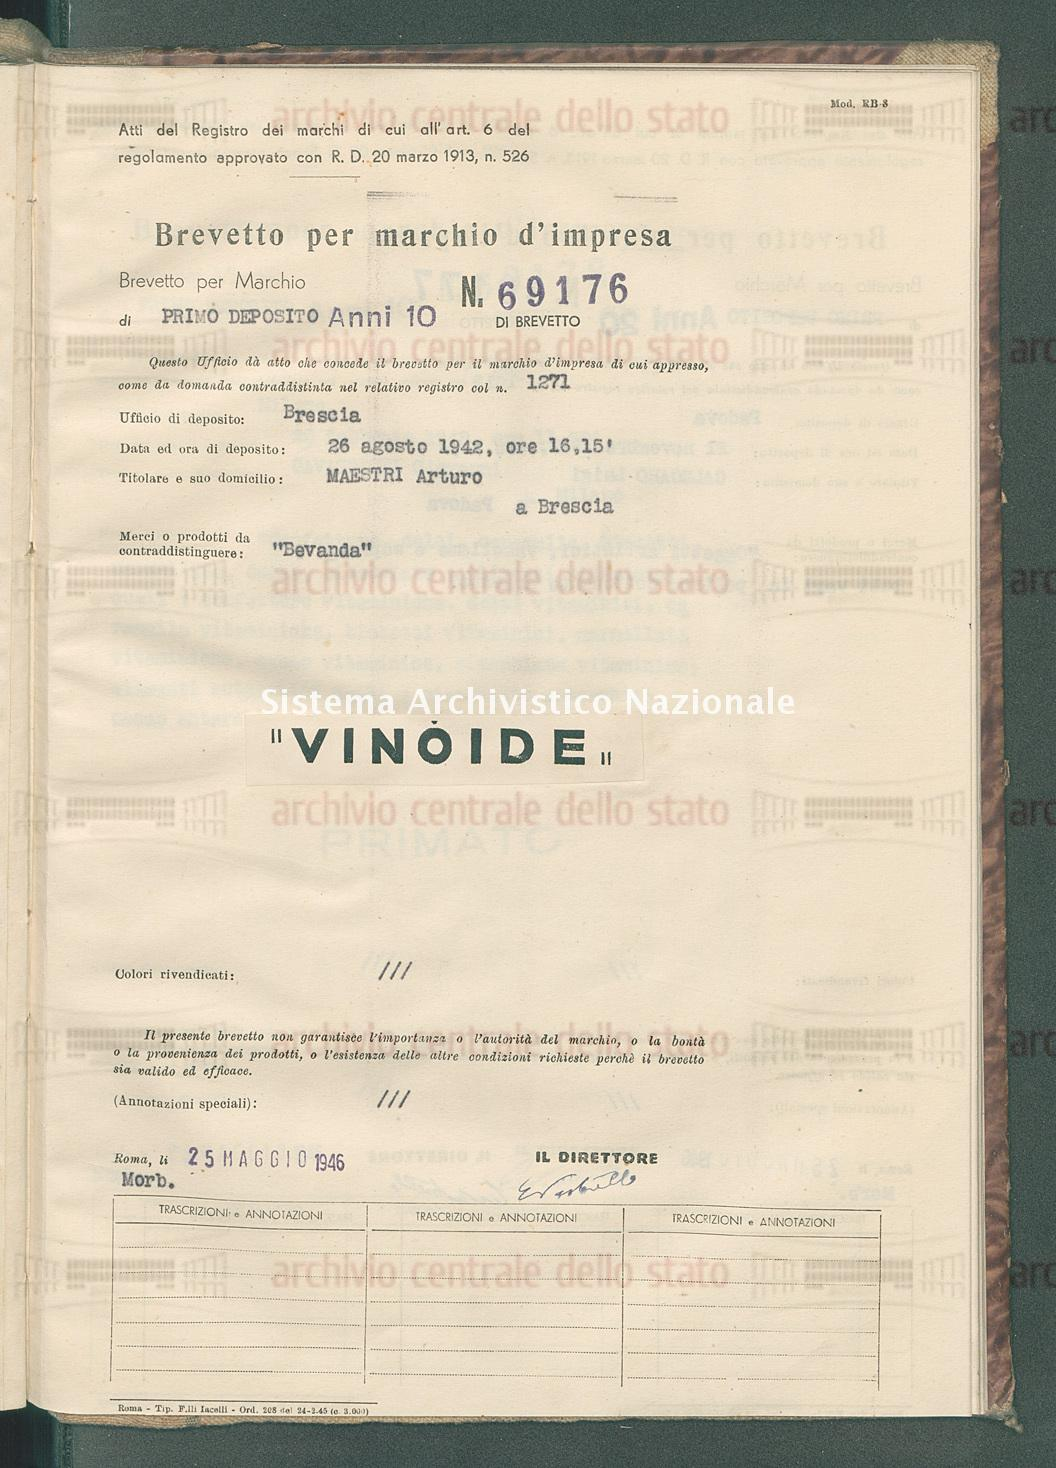 'Bevanda' Maestri Arturo (25/05/1946)